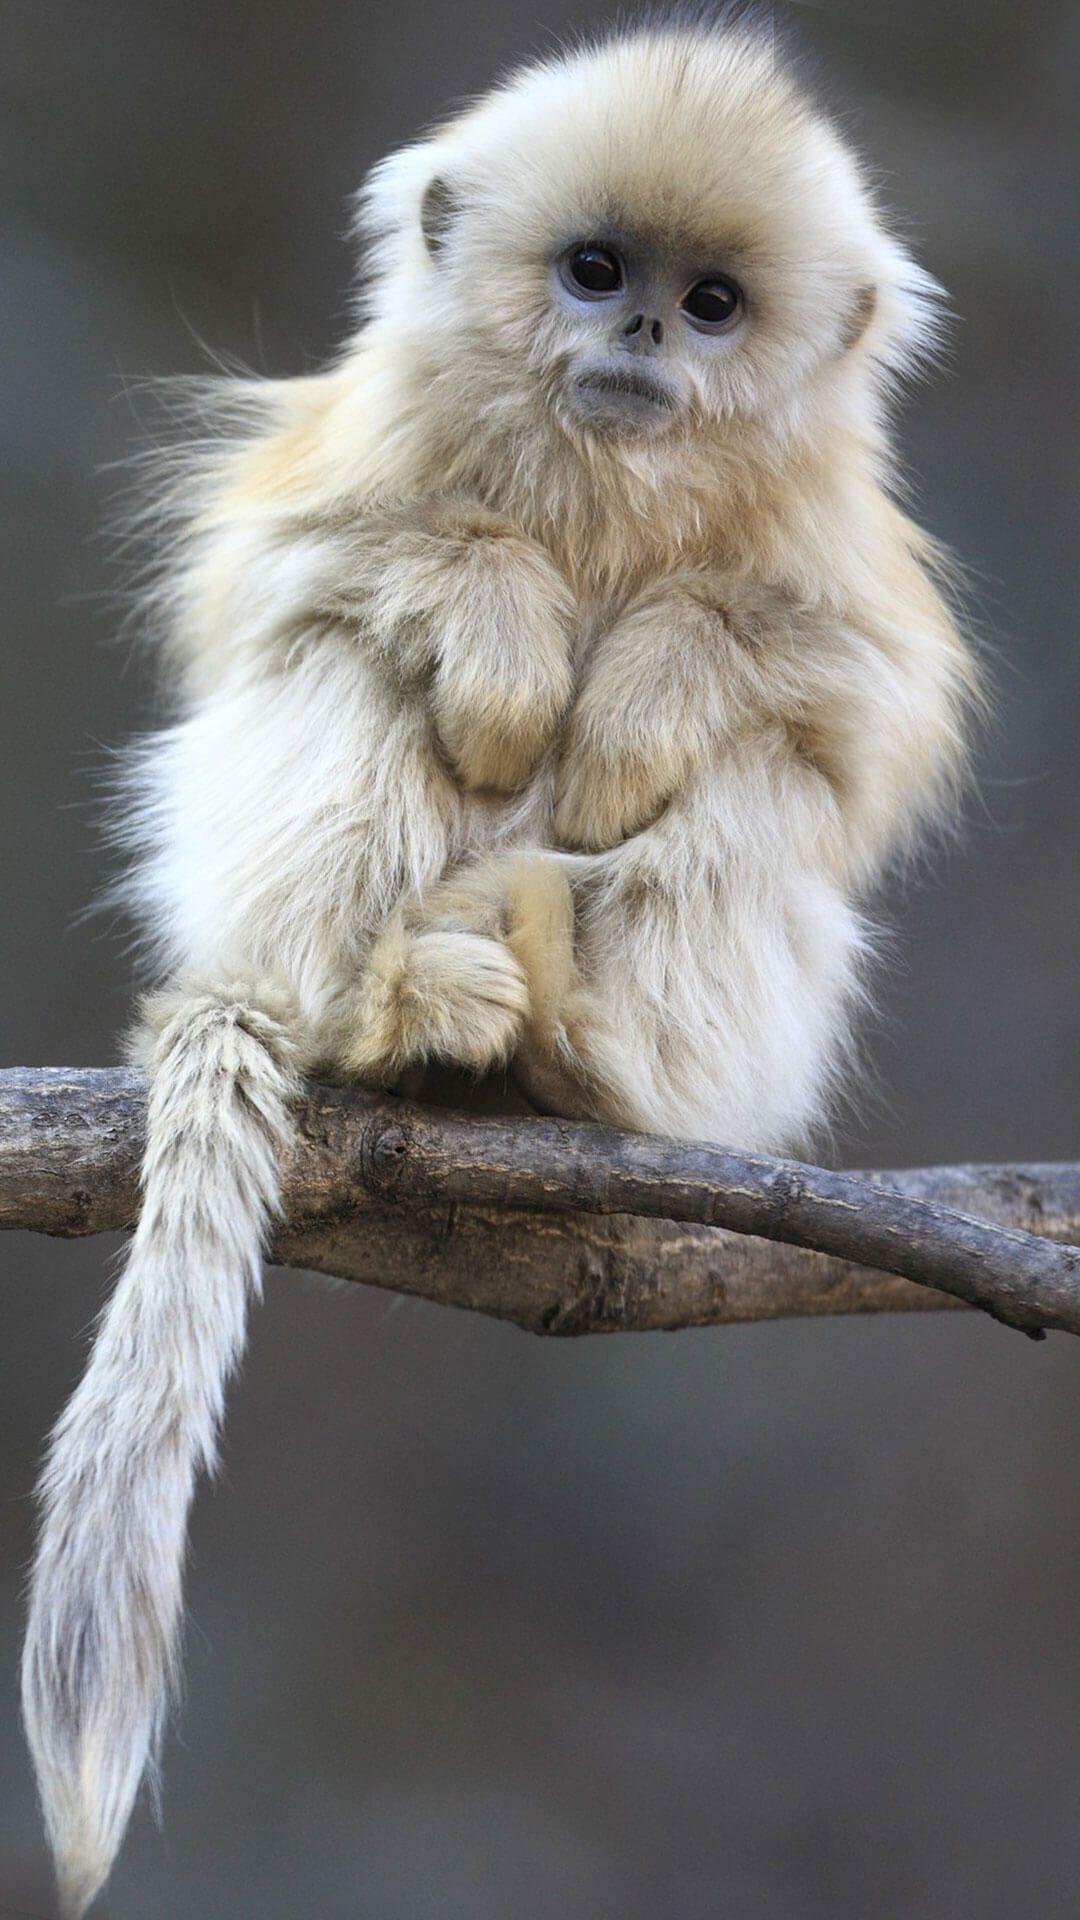 28 Cute Monkeys Wallpapers On Wallpapersafari